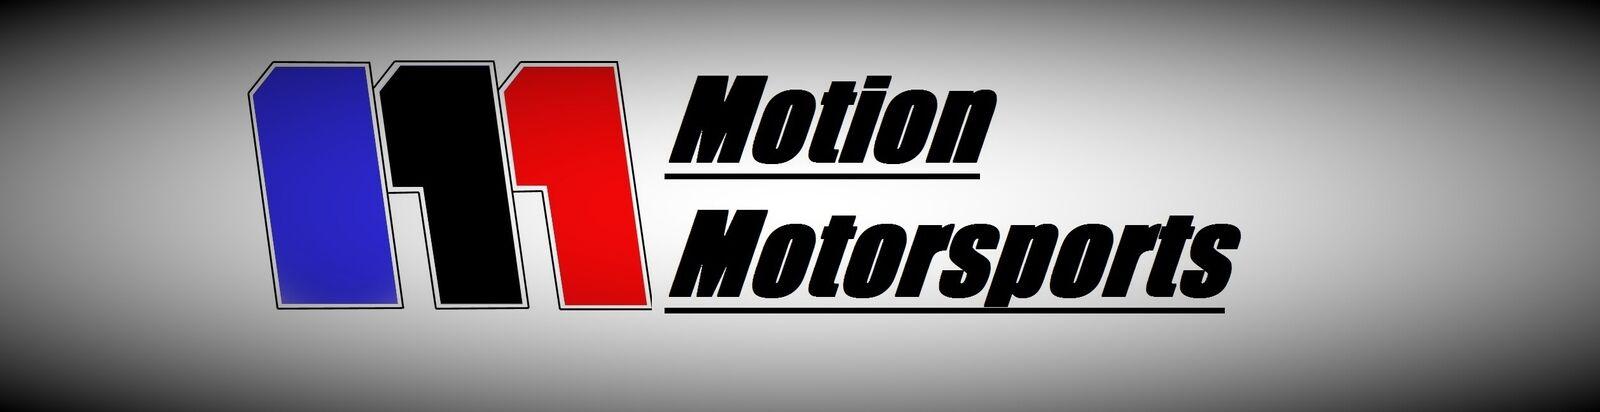 Motion Motorsports